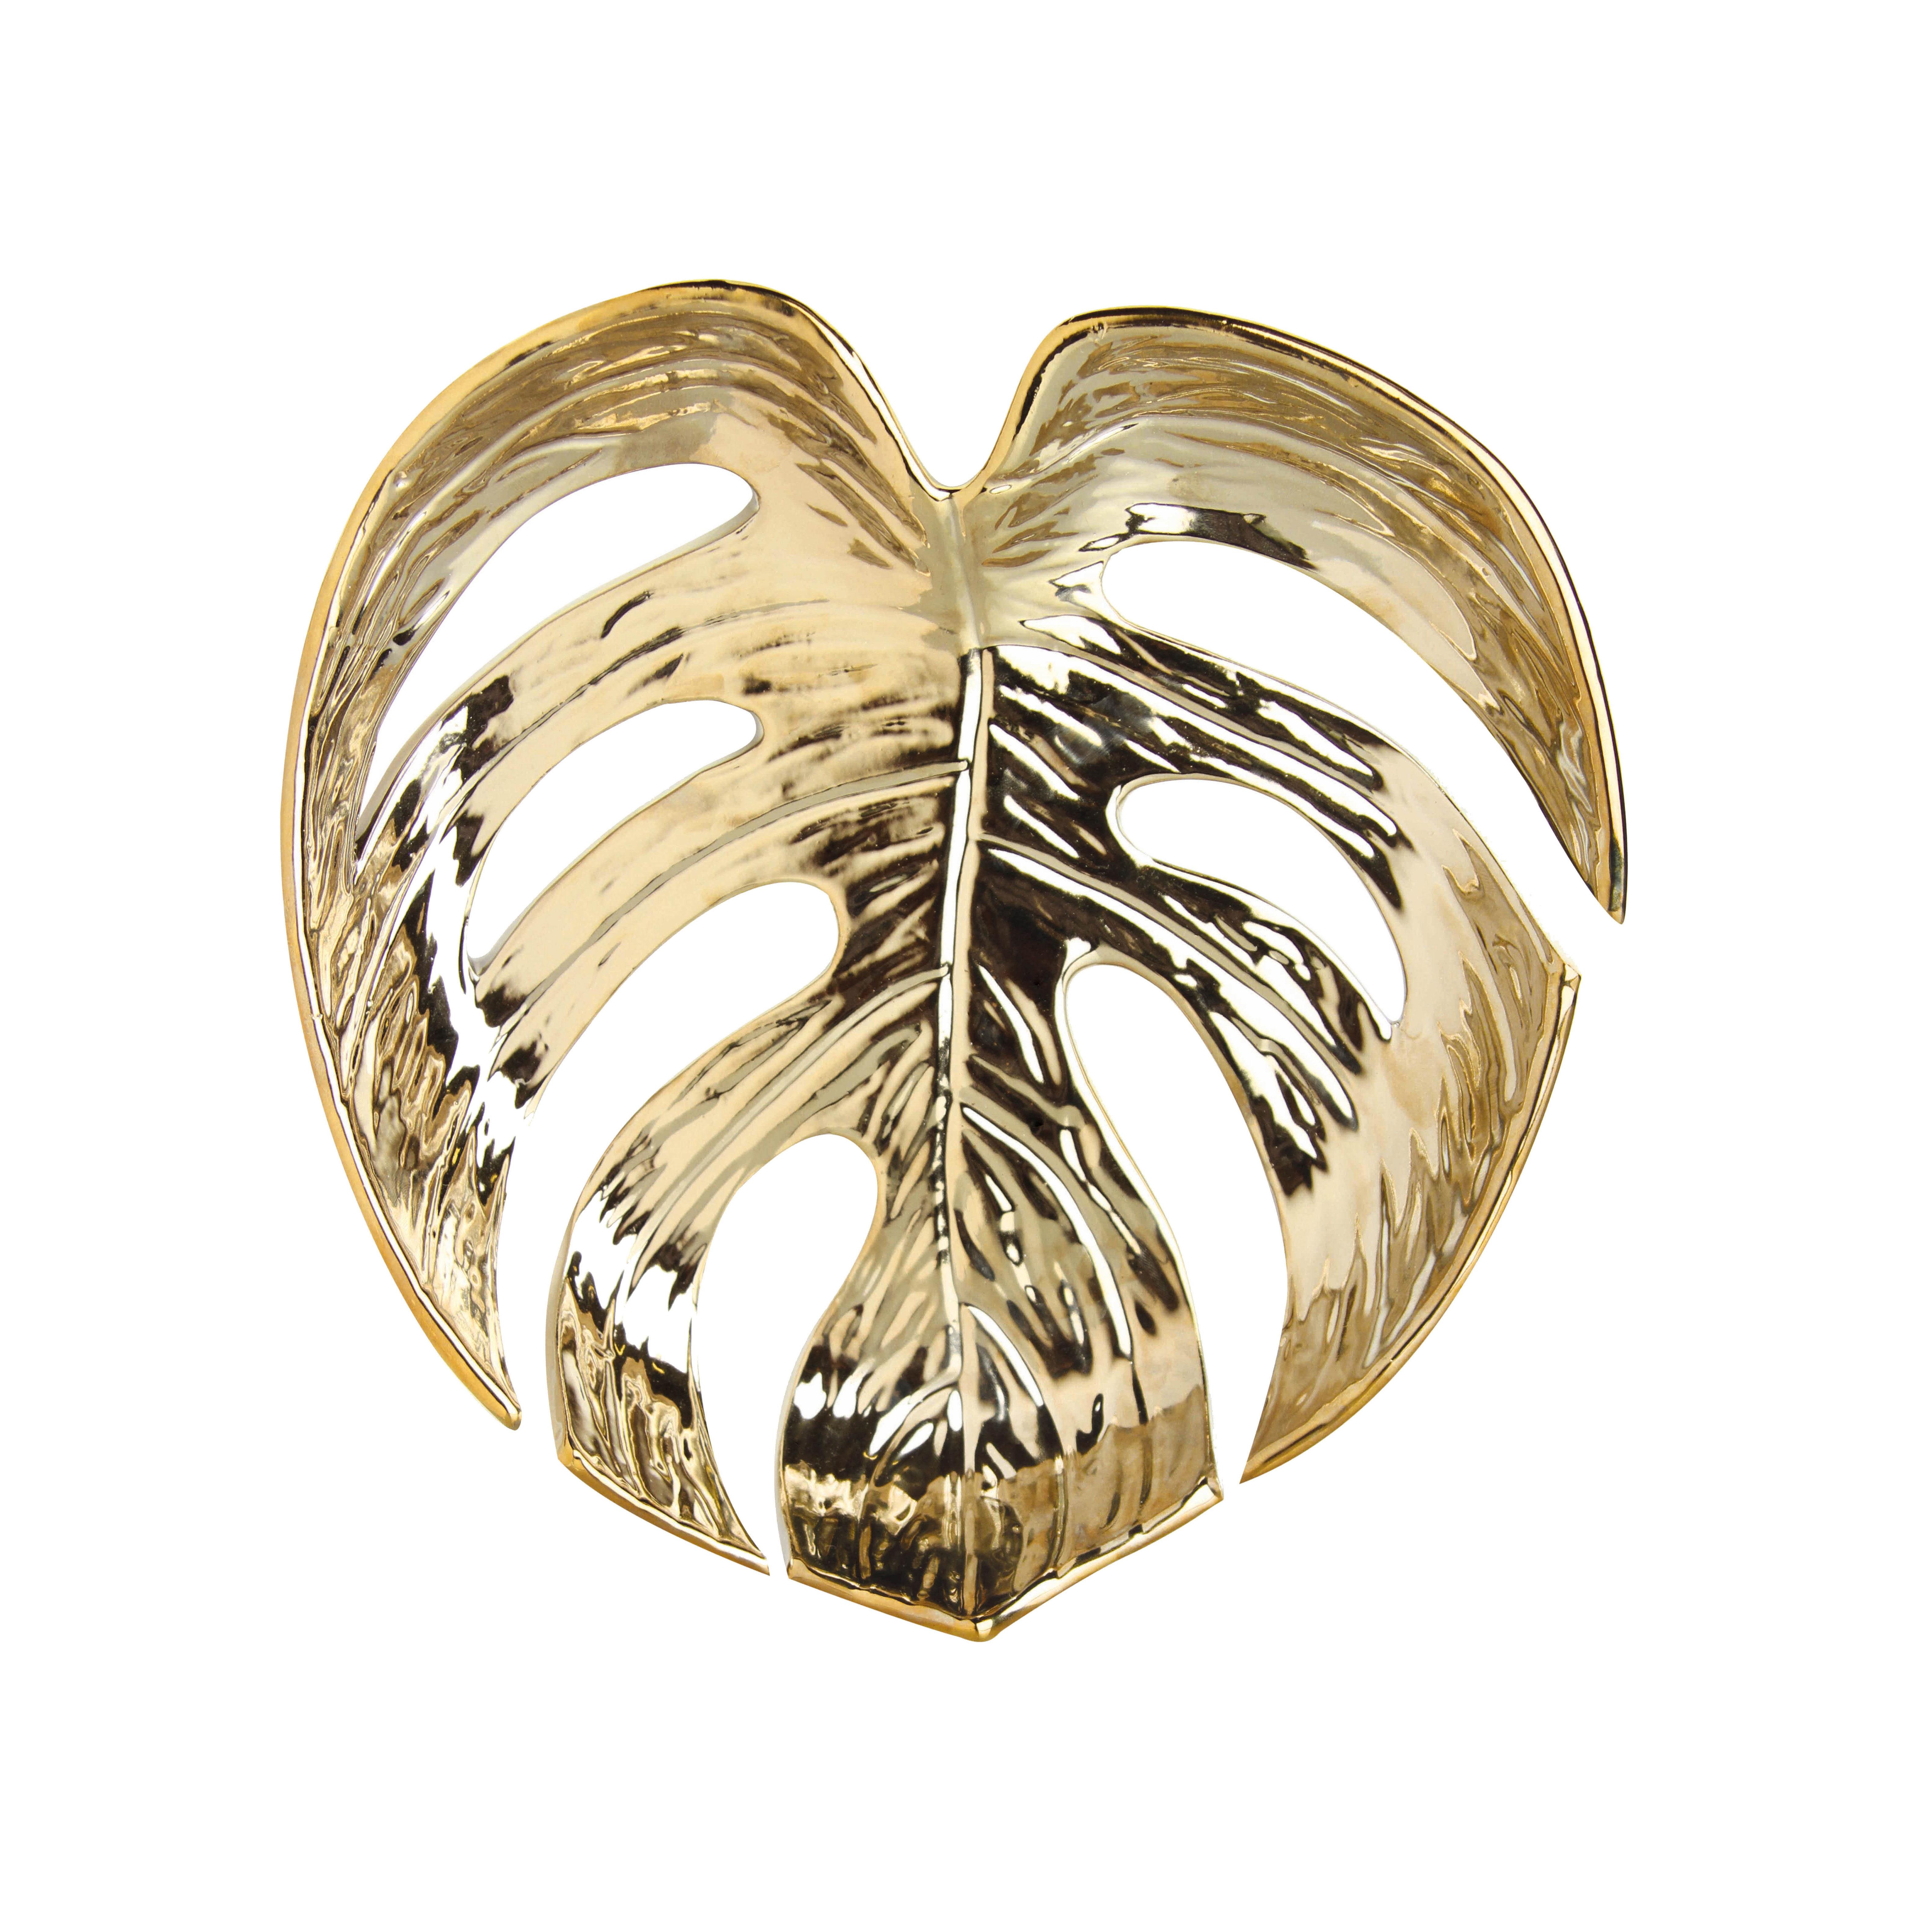 Tavola - Cesti, Fruttiere e Centrotavola - Cesto Leaf Medium - / Porcellana - 25 x 26 cm di & klevering - Medium / Dorato - Porcellana